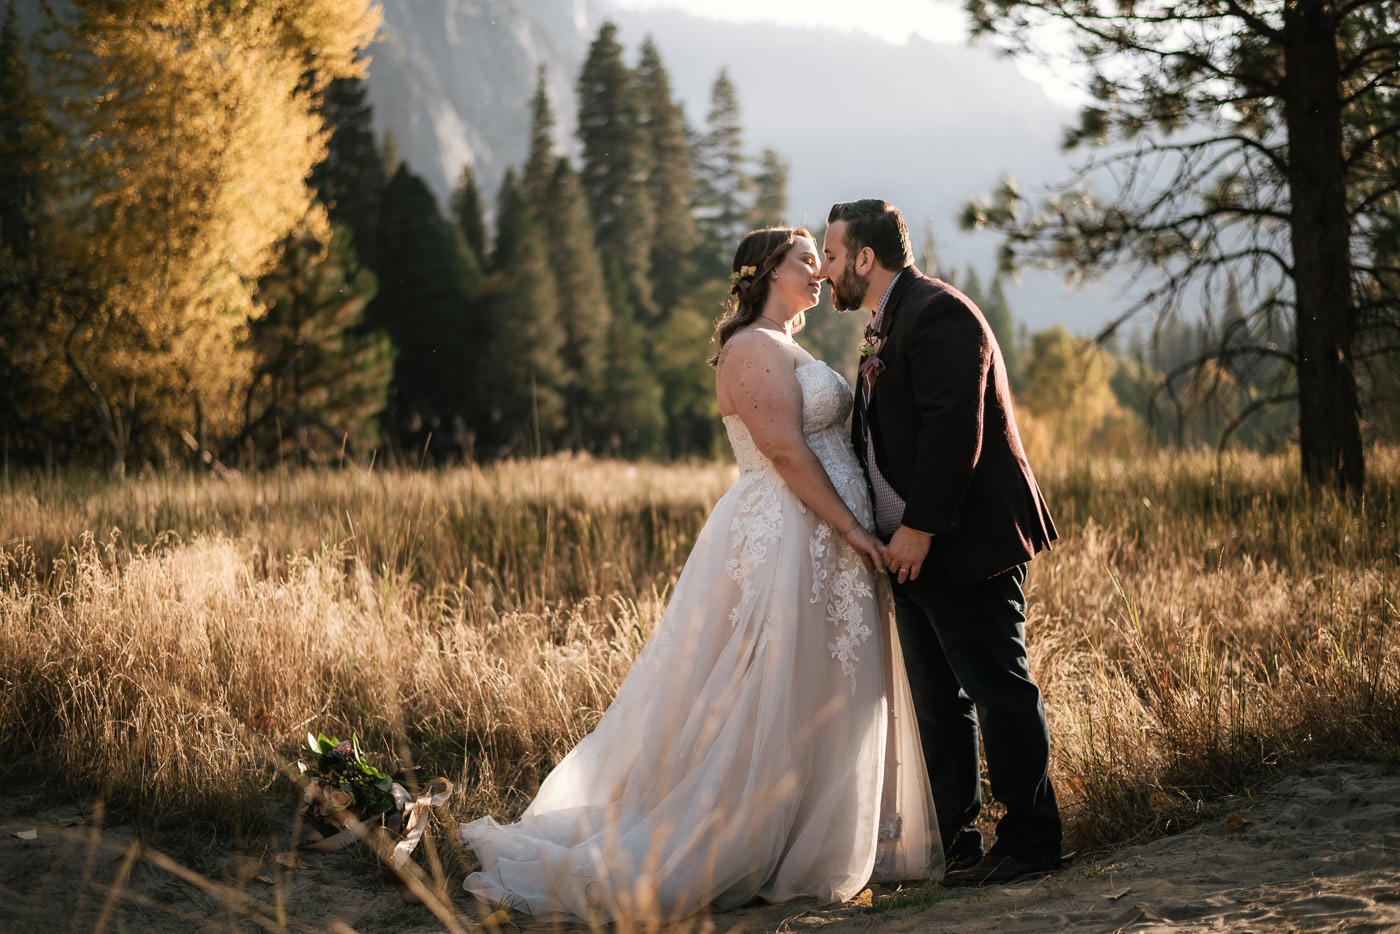 yosemite-meadow-wedding-photos-sunset-29.jpg